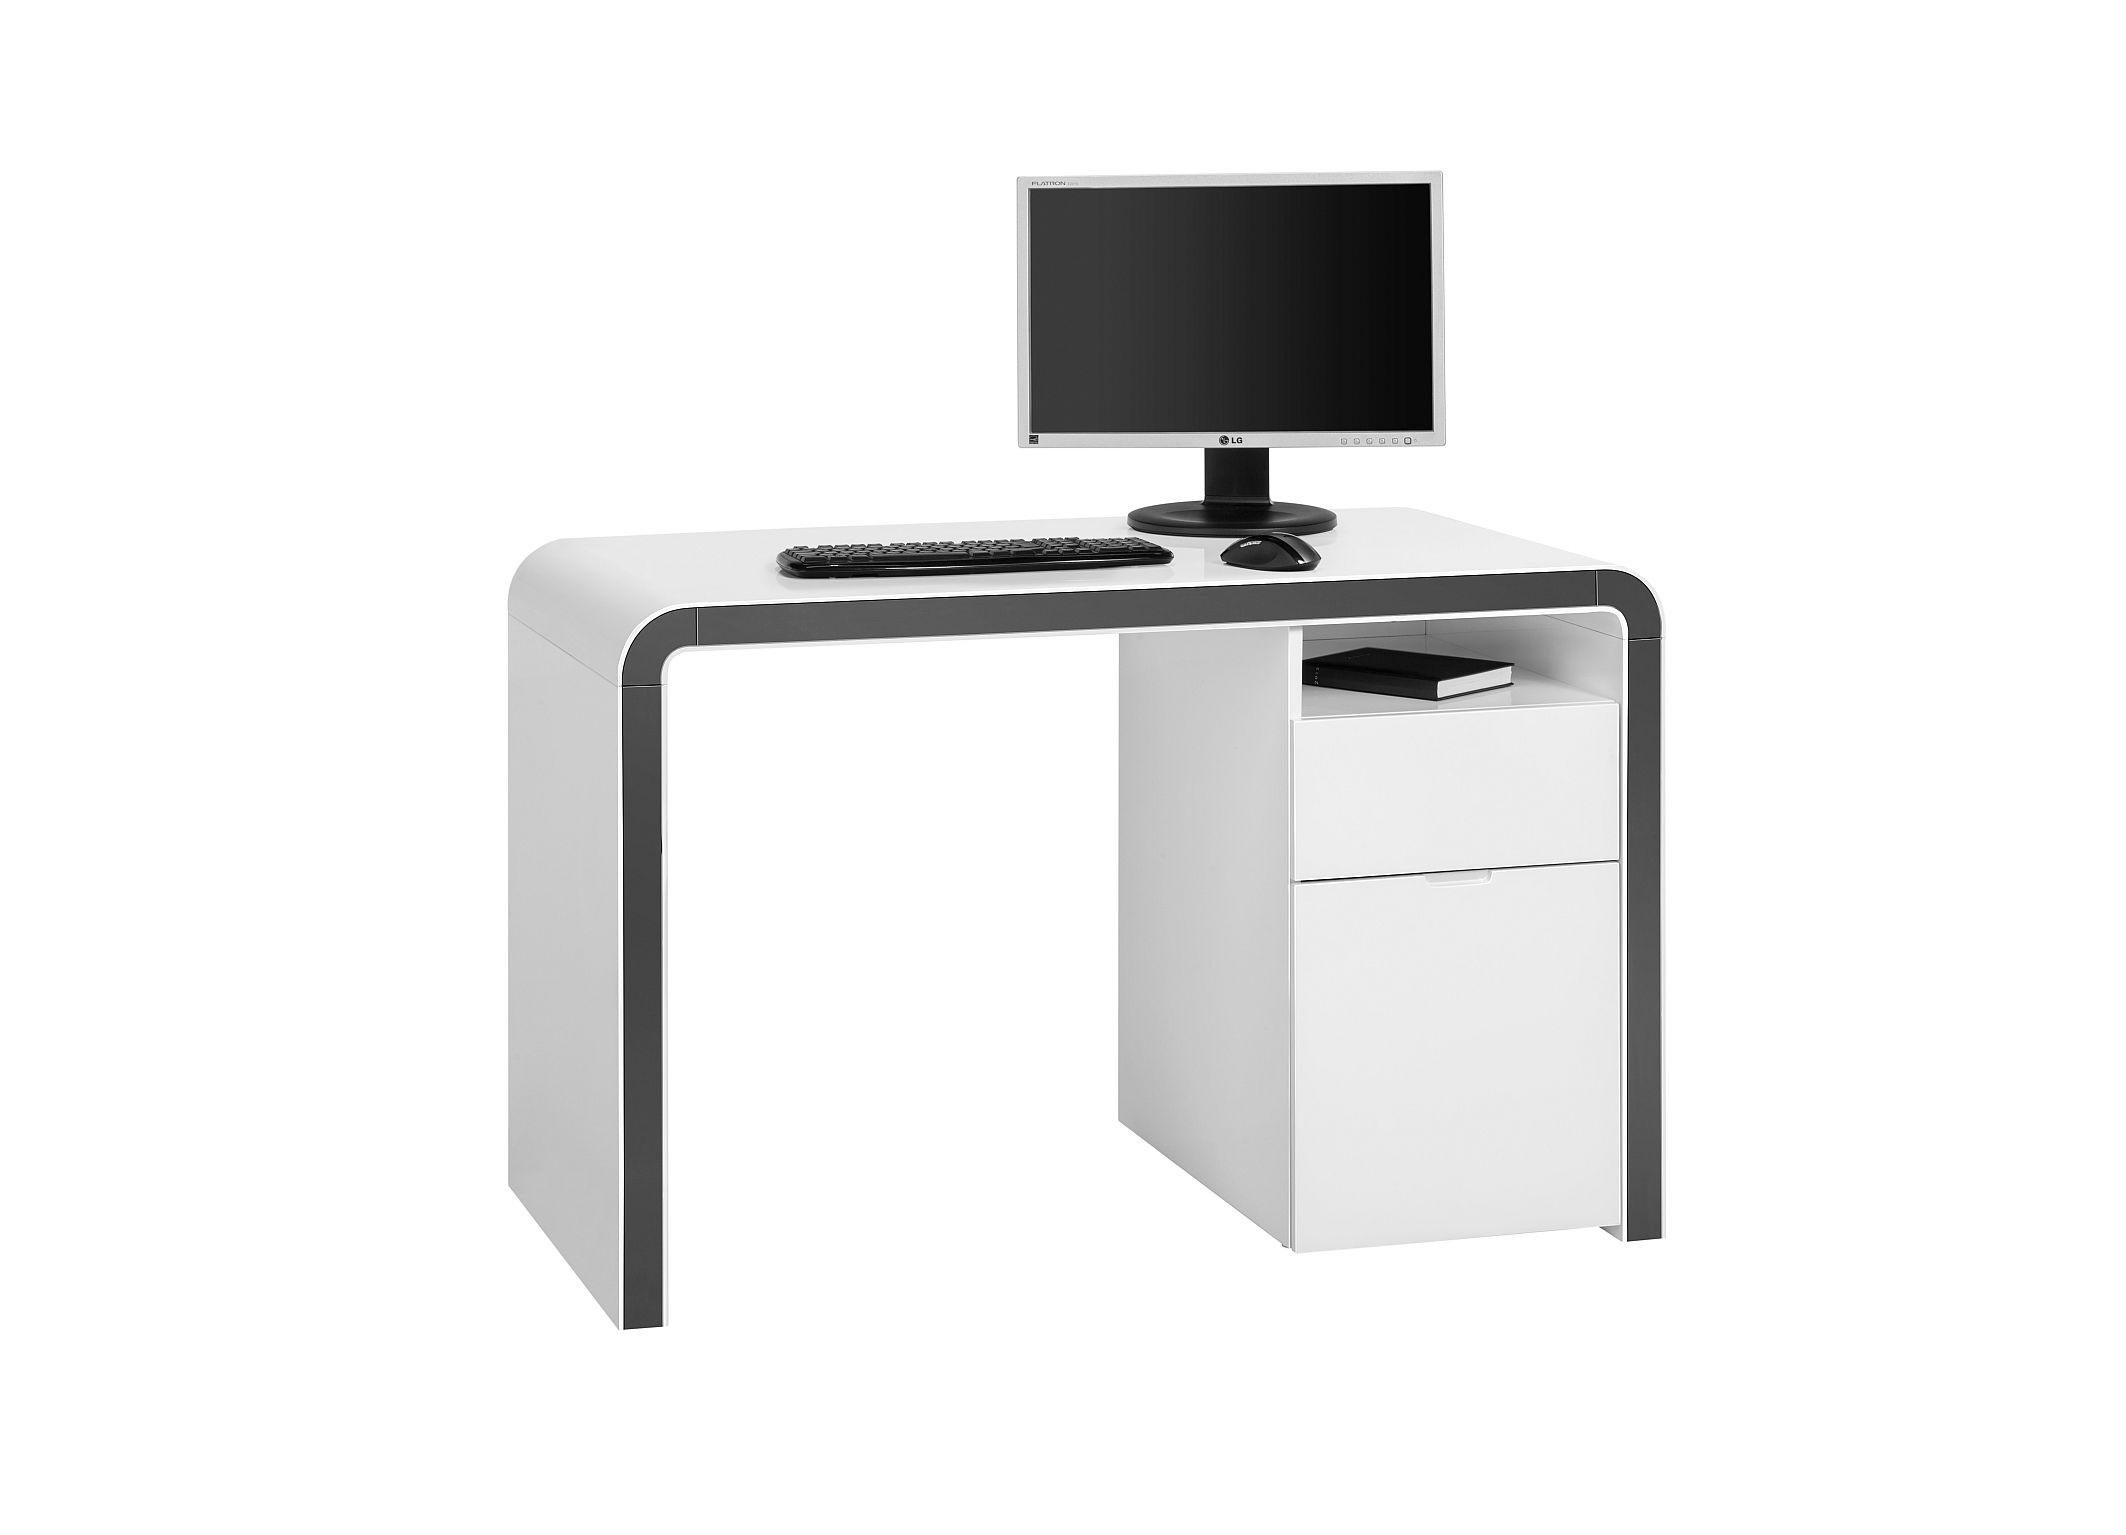 Bureau informatique design laqu blanc sintra - Bureau informatique blanc laque ...